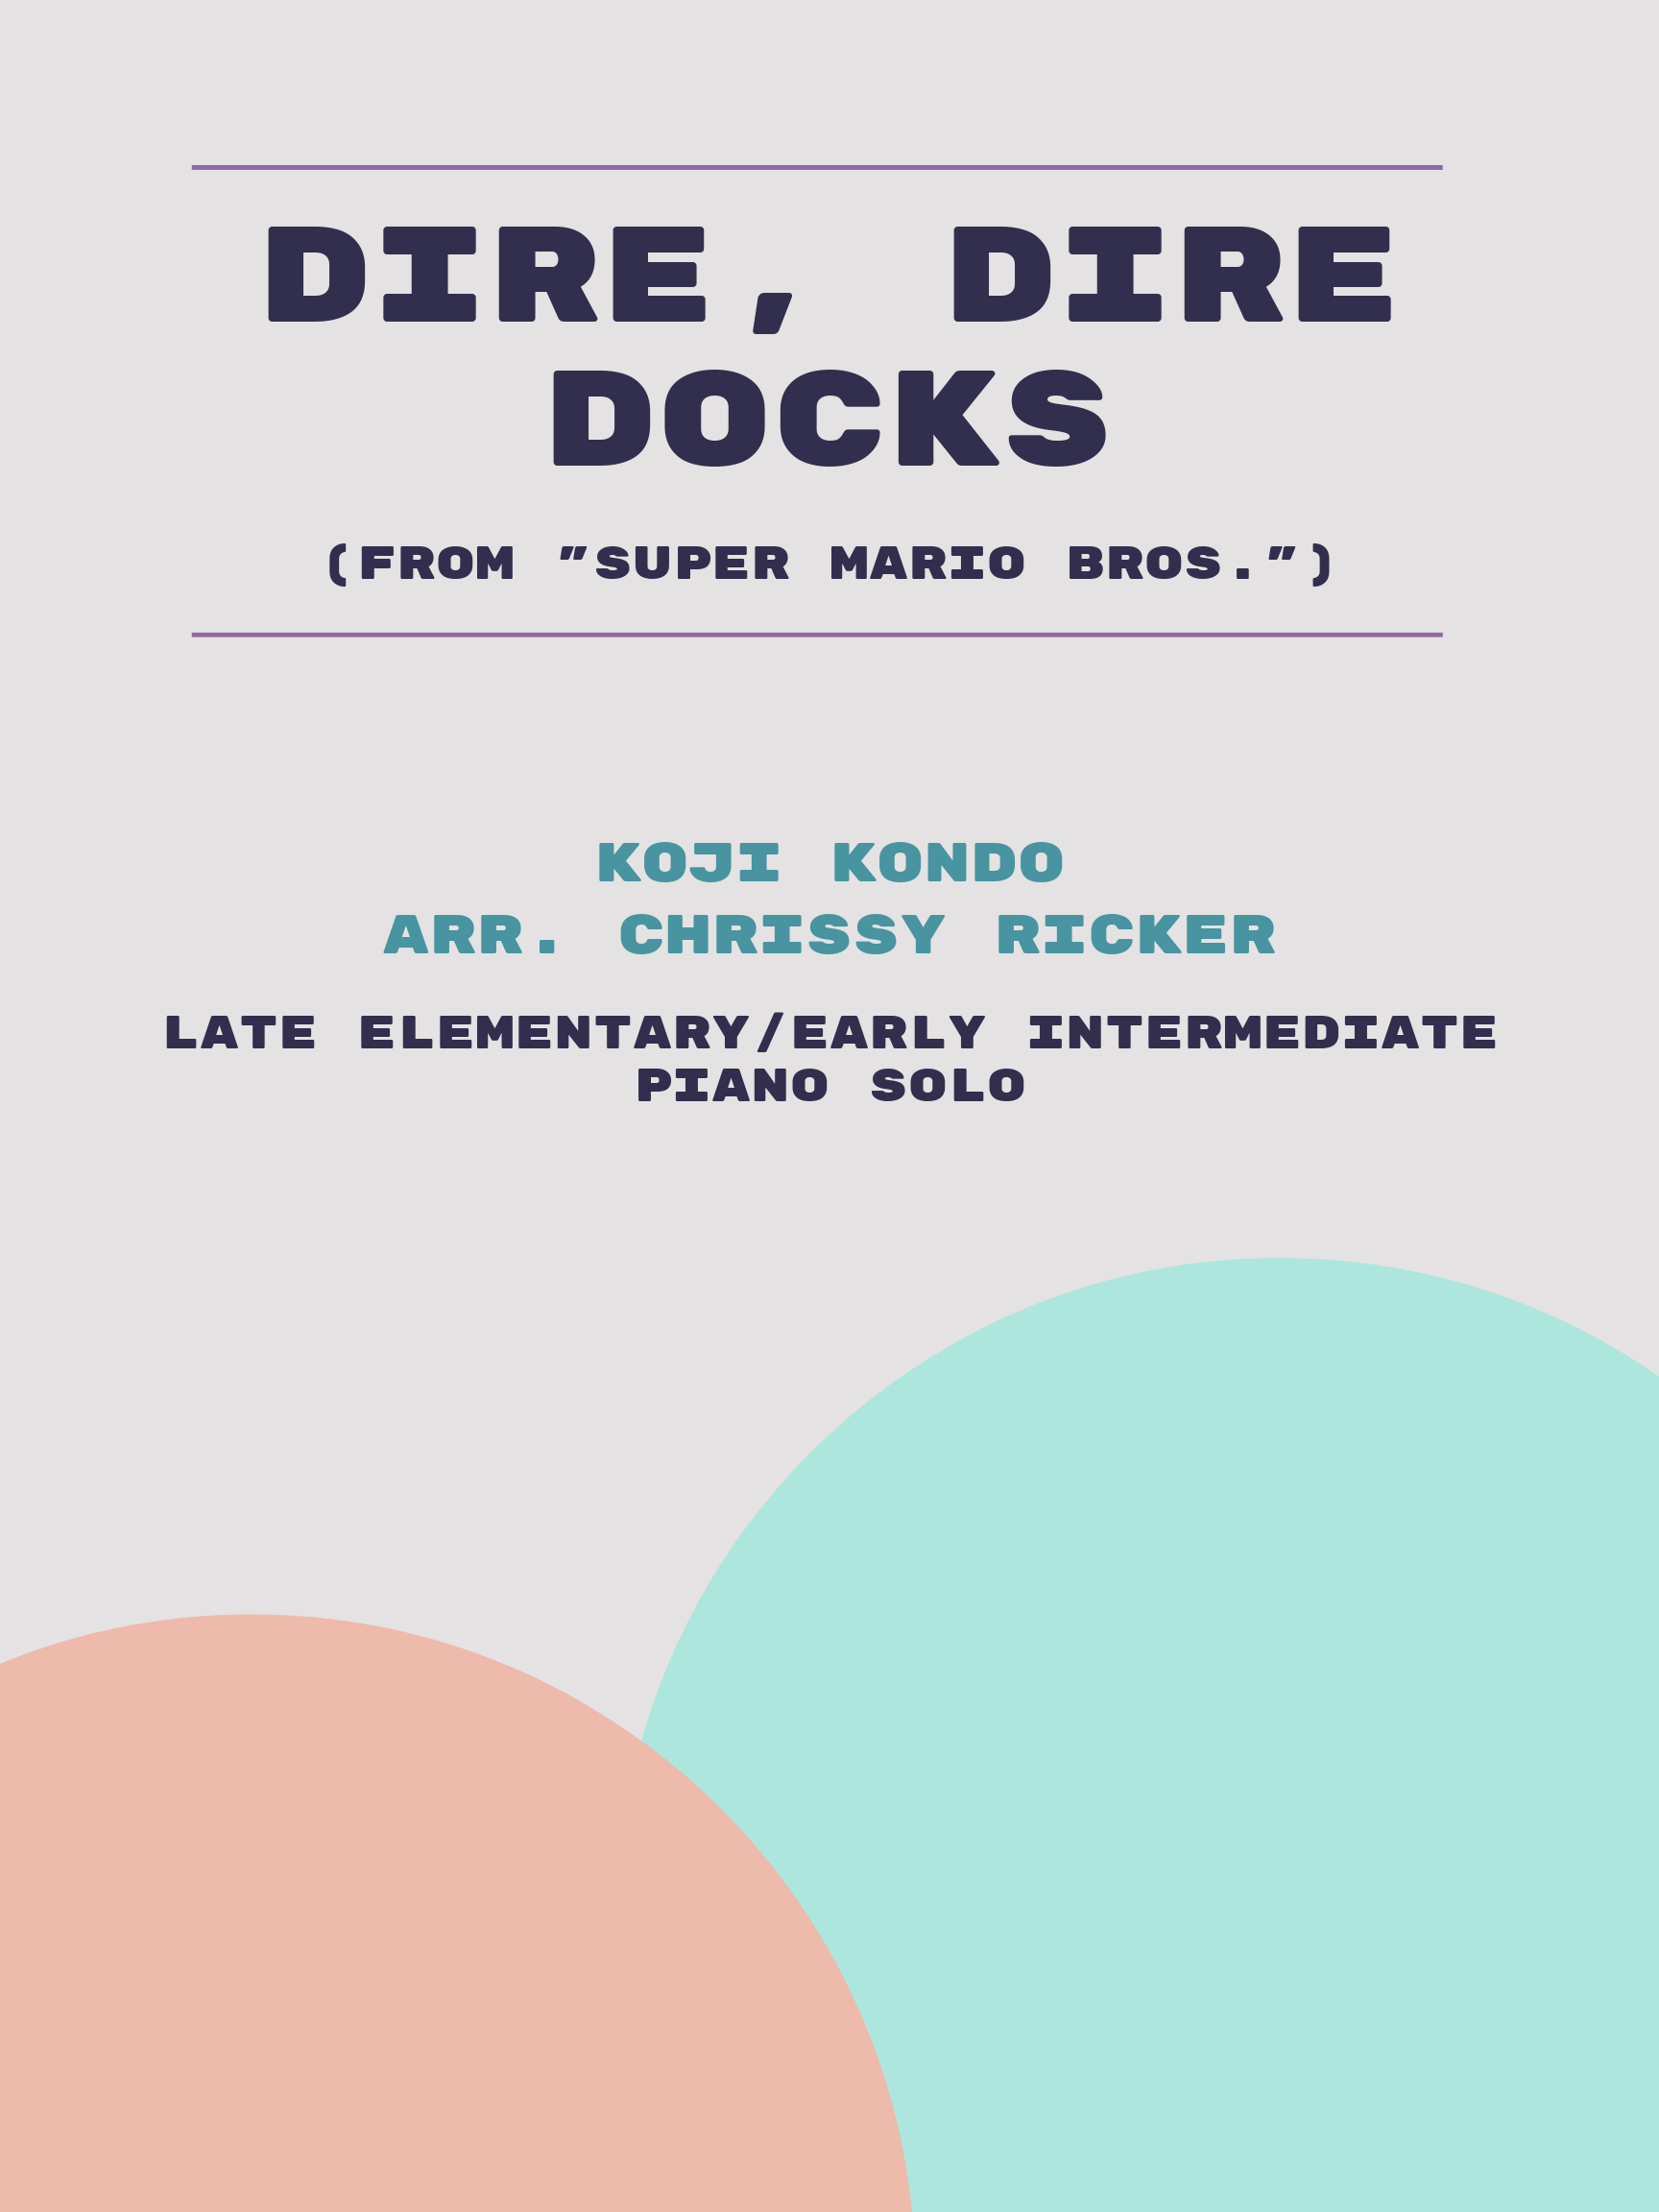 Dire, Dire Docks by Koji Kondo